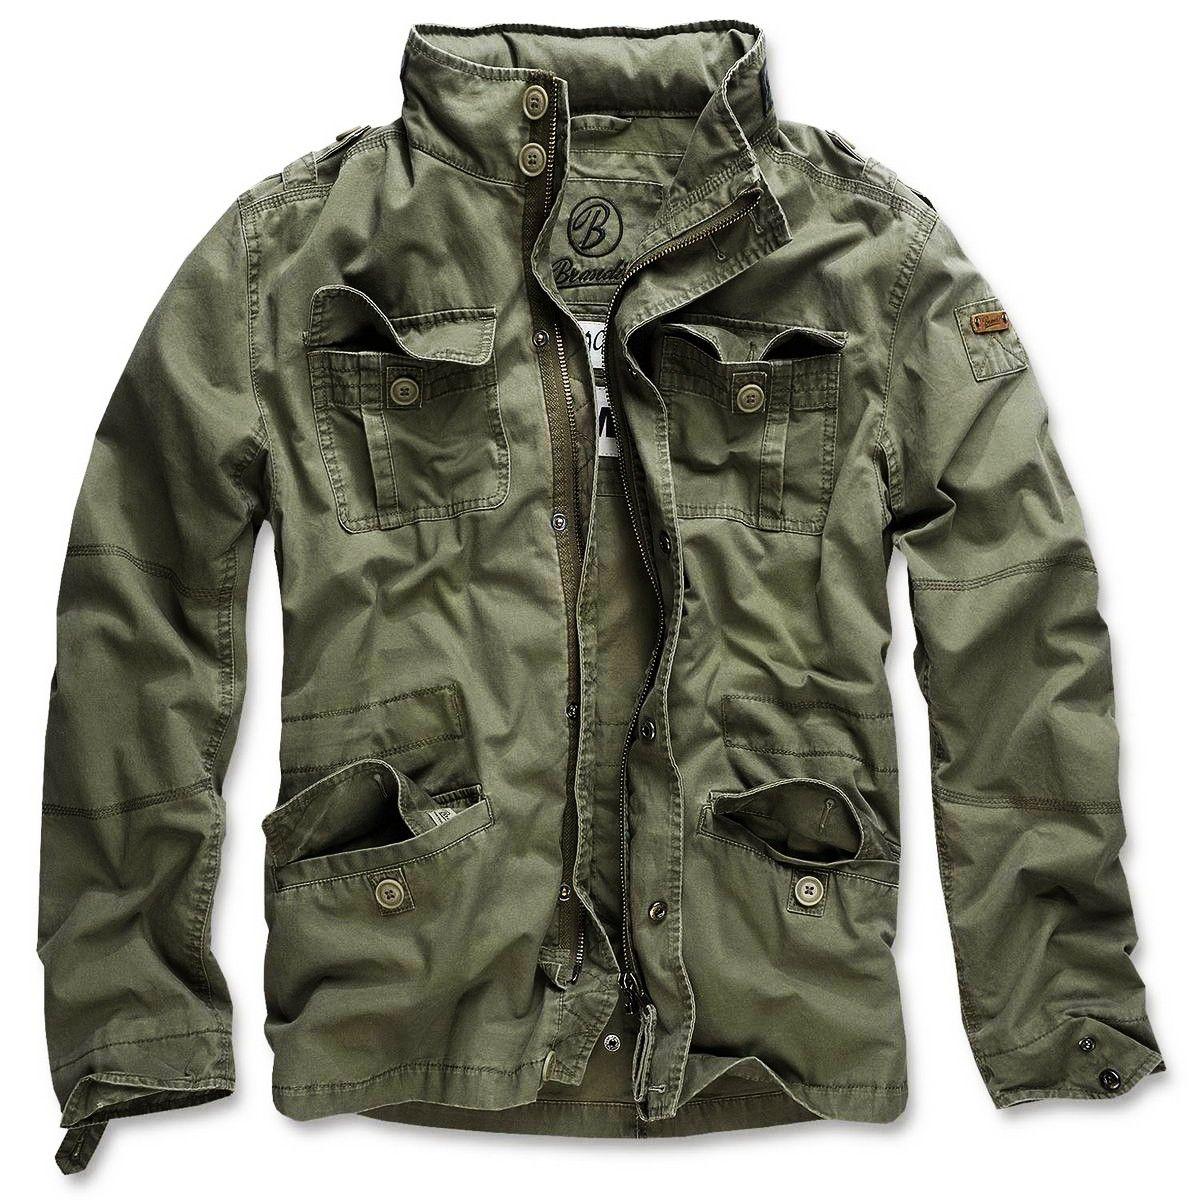 4b598554fd VESTE Militair BRITANIA | Vêtements hommes | Giacche militari ...